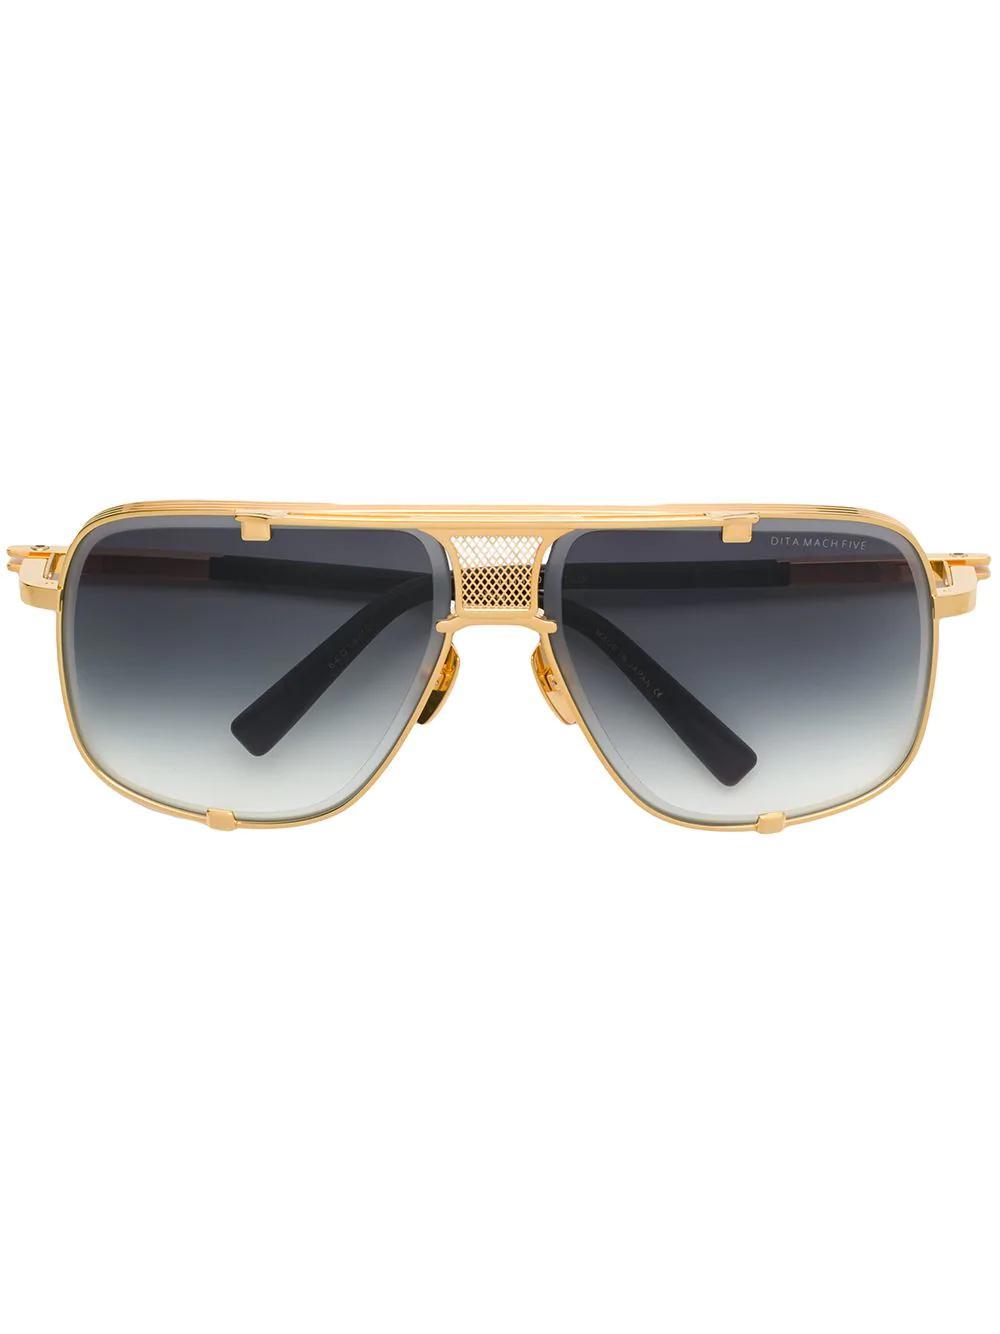 132e41bfed Dita Eyewear Mach Five Sunglasses - Gold